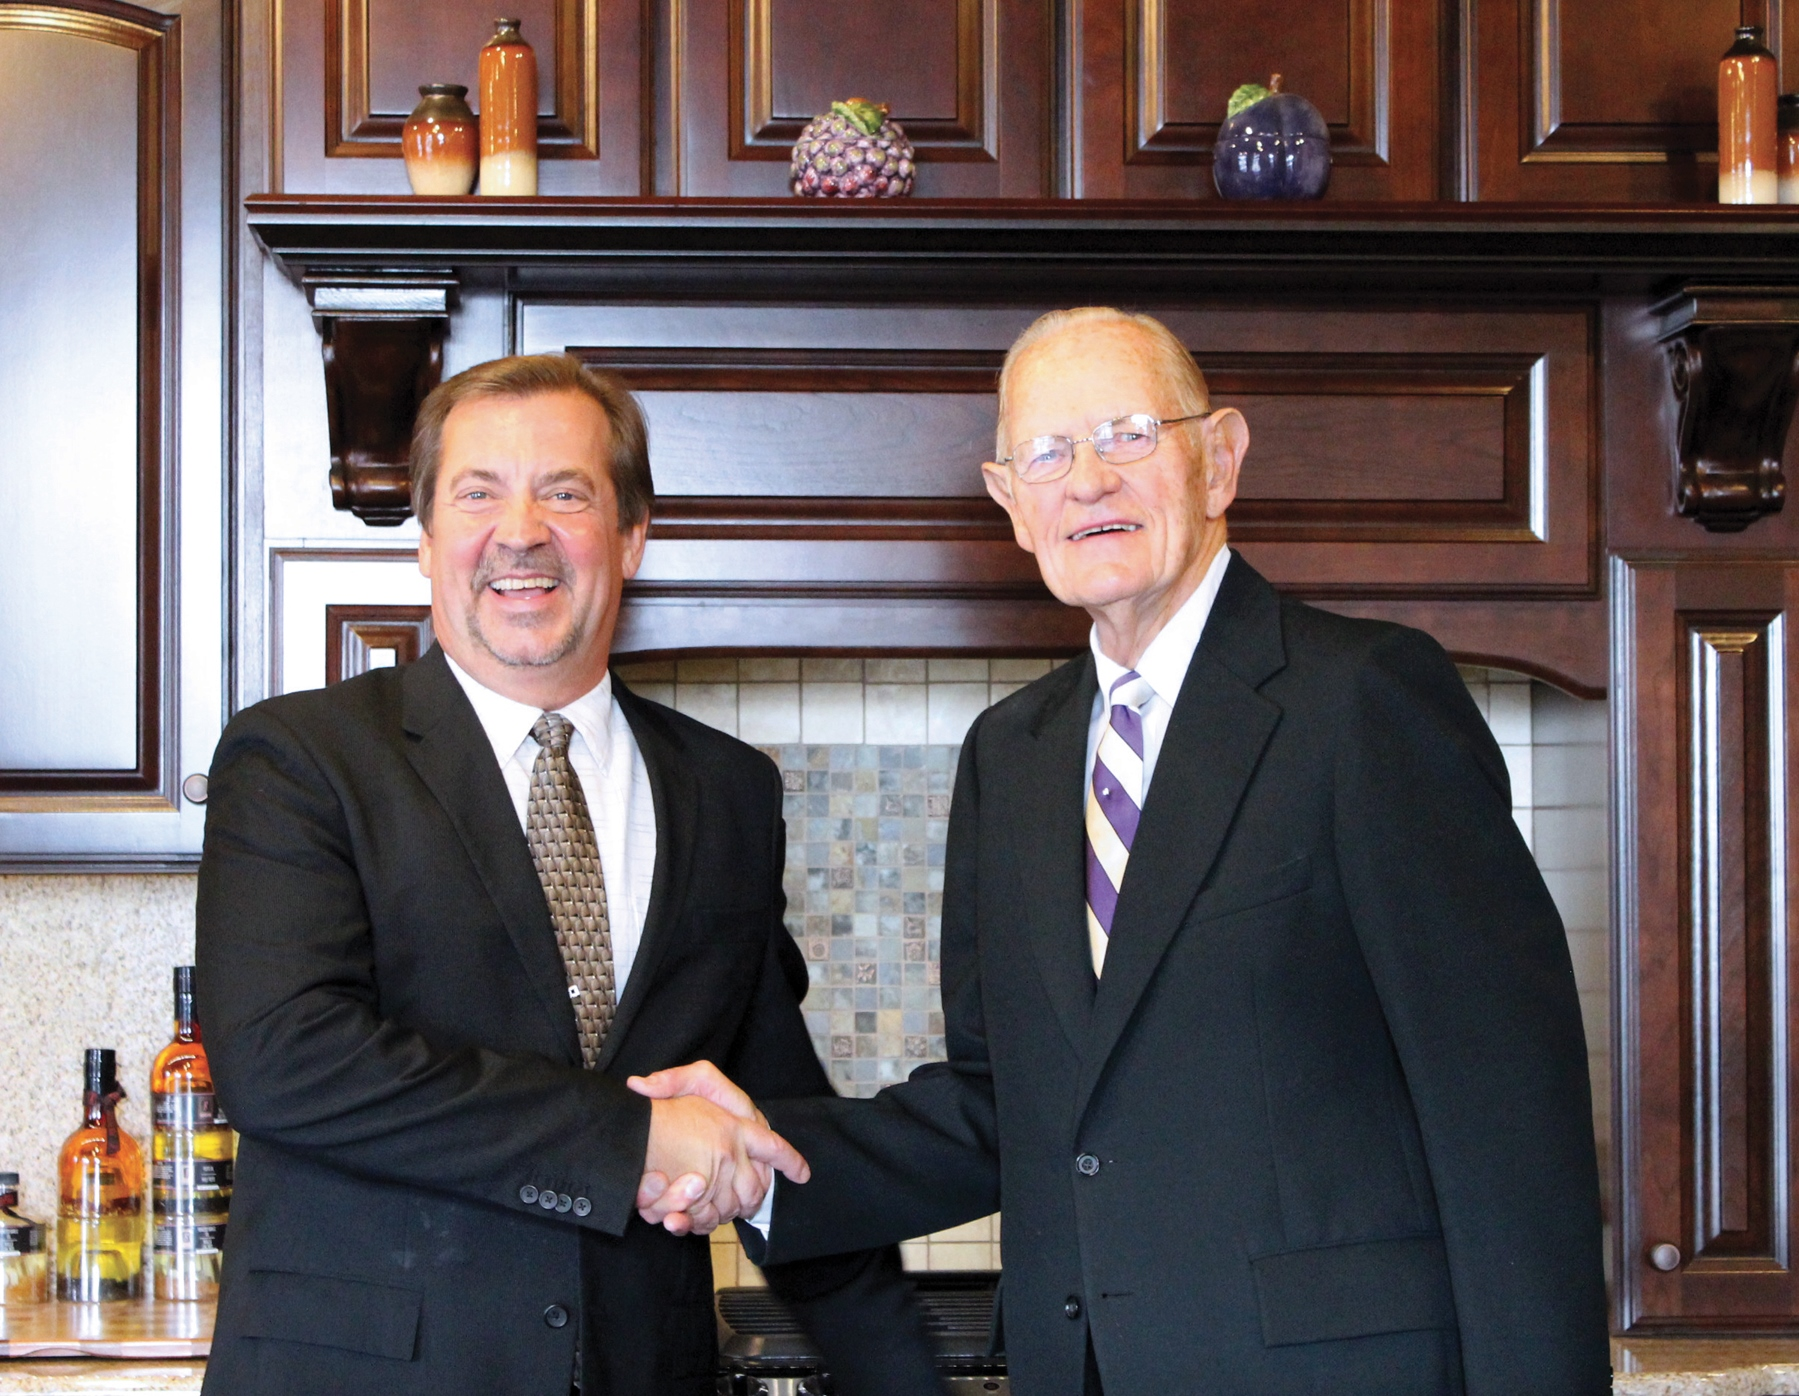 Paul Johnson & Roger Olson